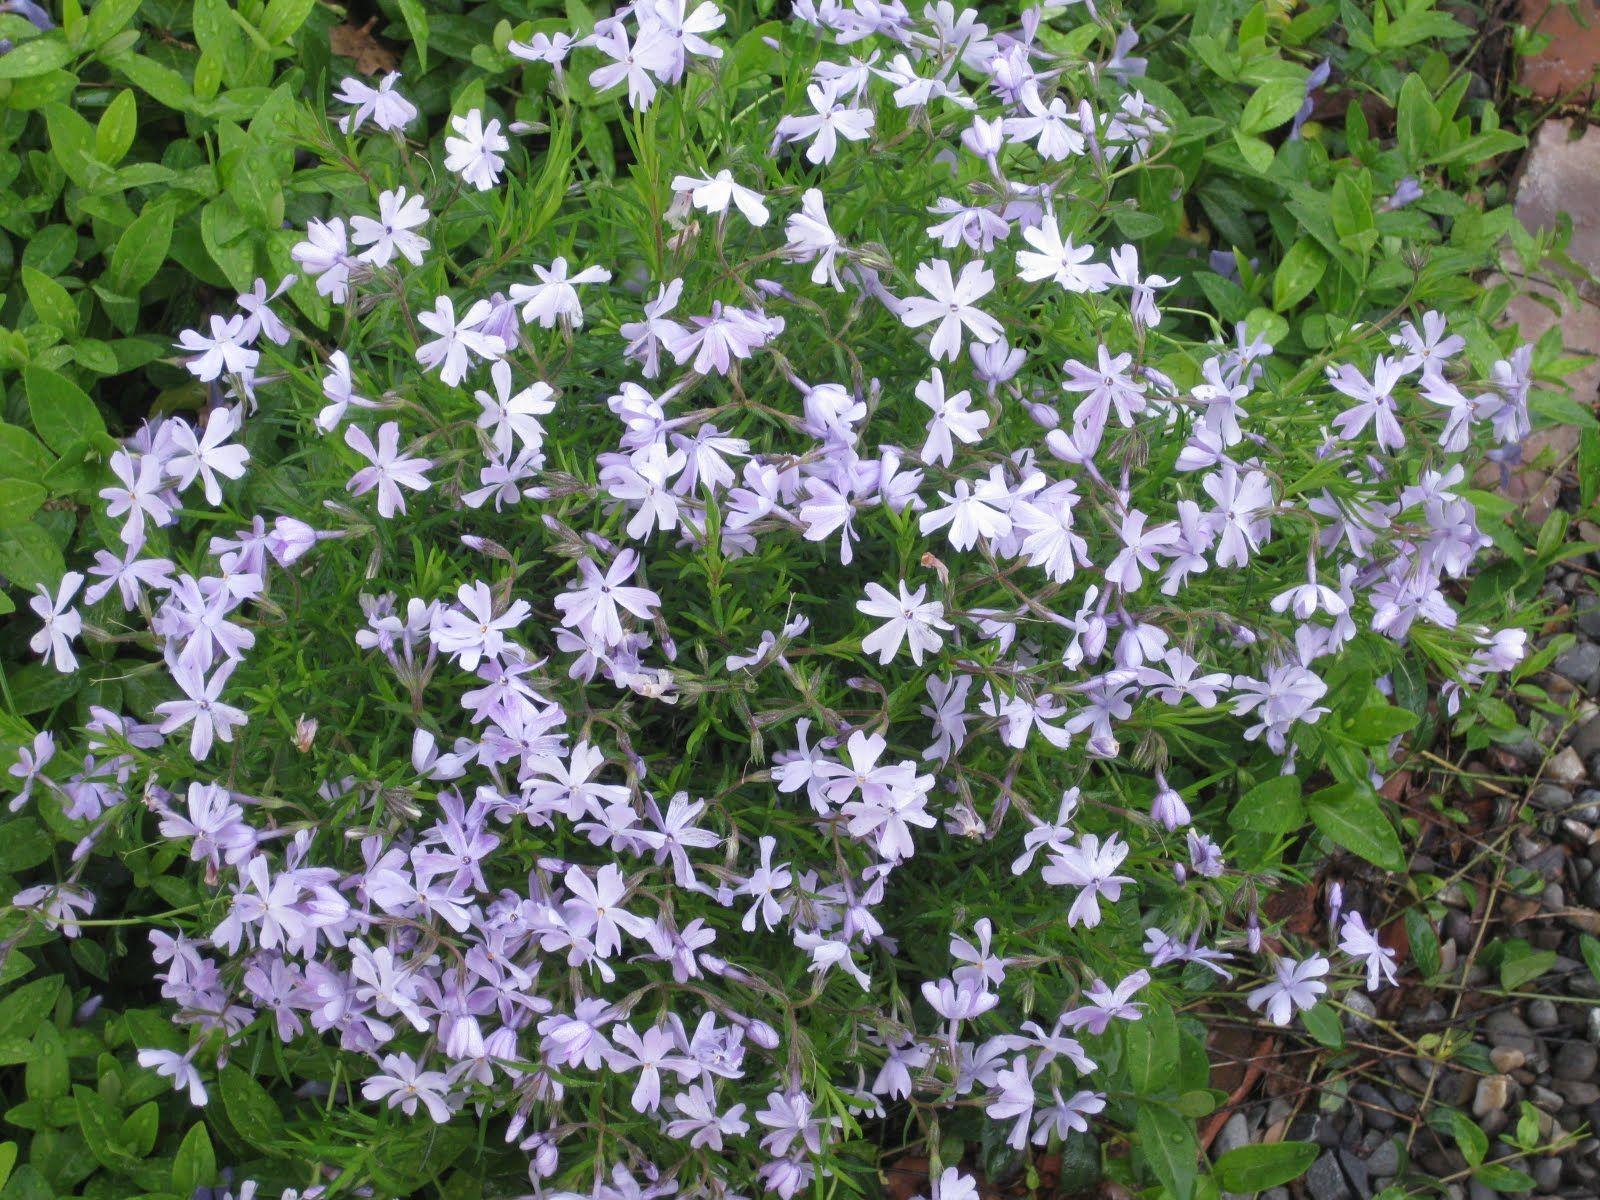 Flowering Perennials For Seashore Gardens Gardening Pinterest